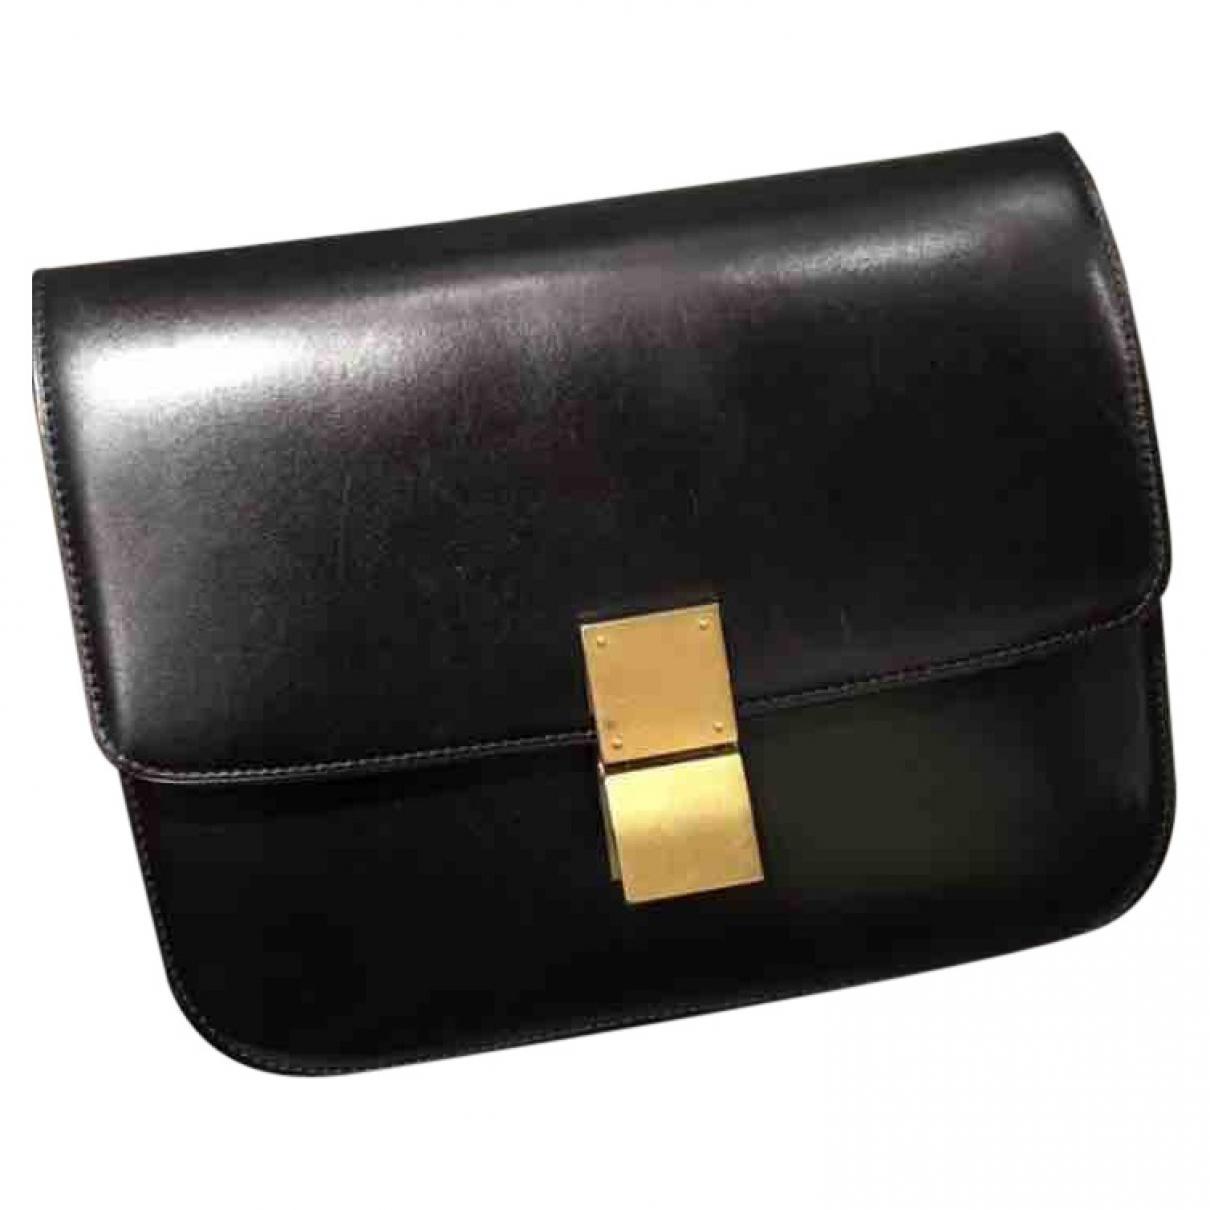 694543f636 Céline Classic Leather Handbag in Black - Lyst